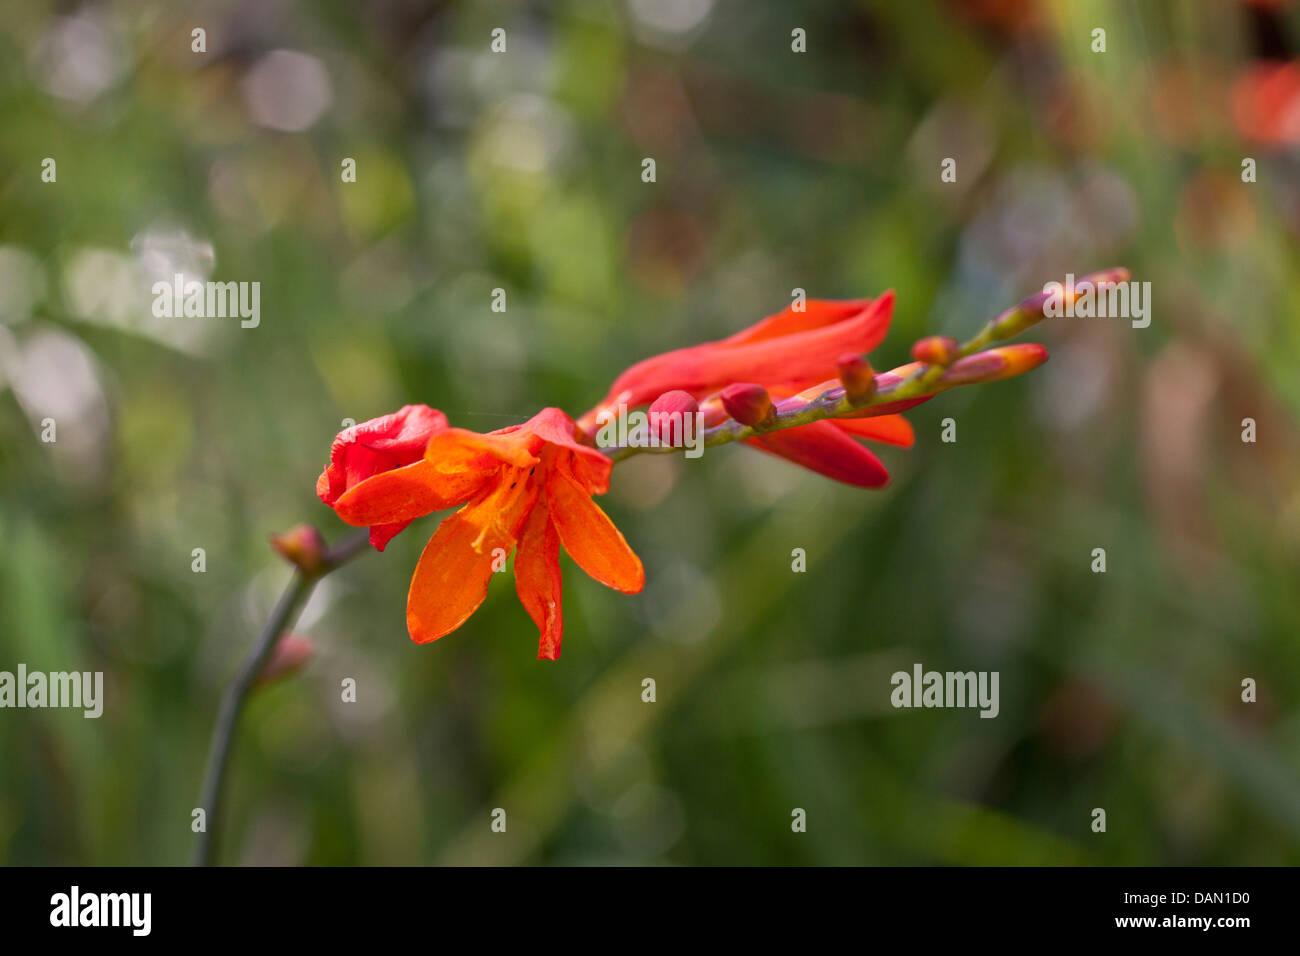 blossom at kruger national park, south africa - Stock Image